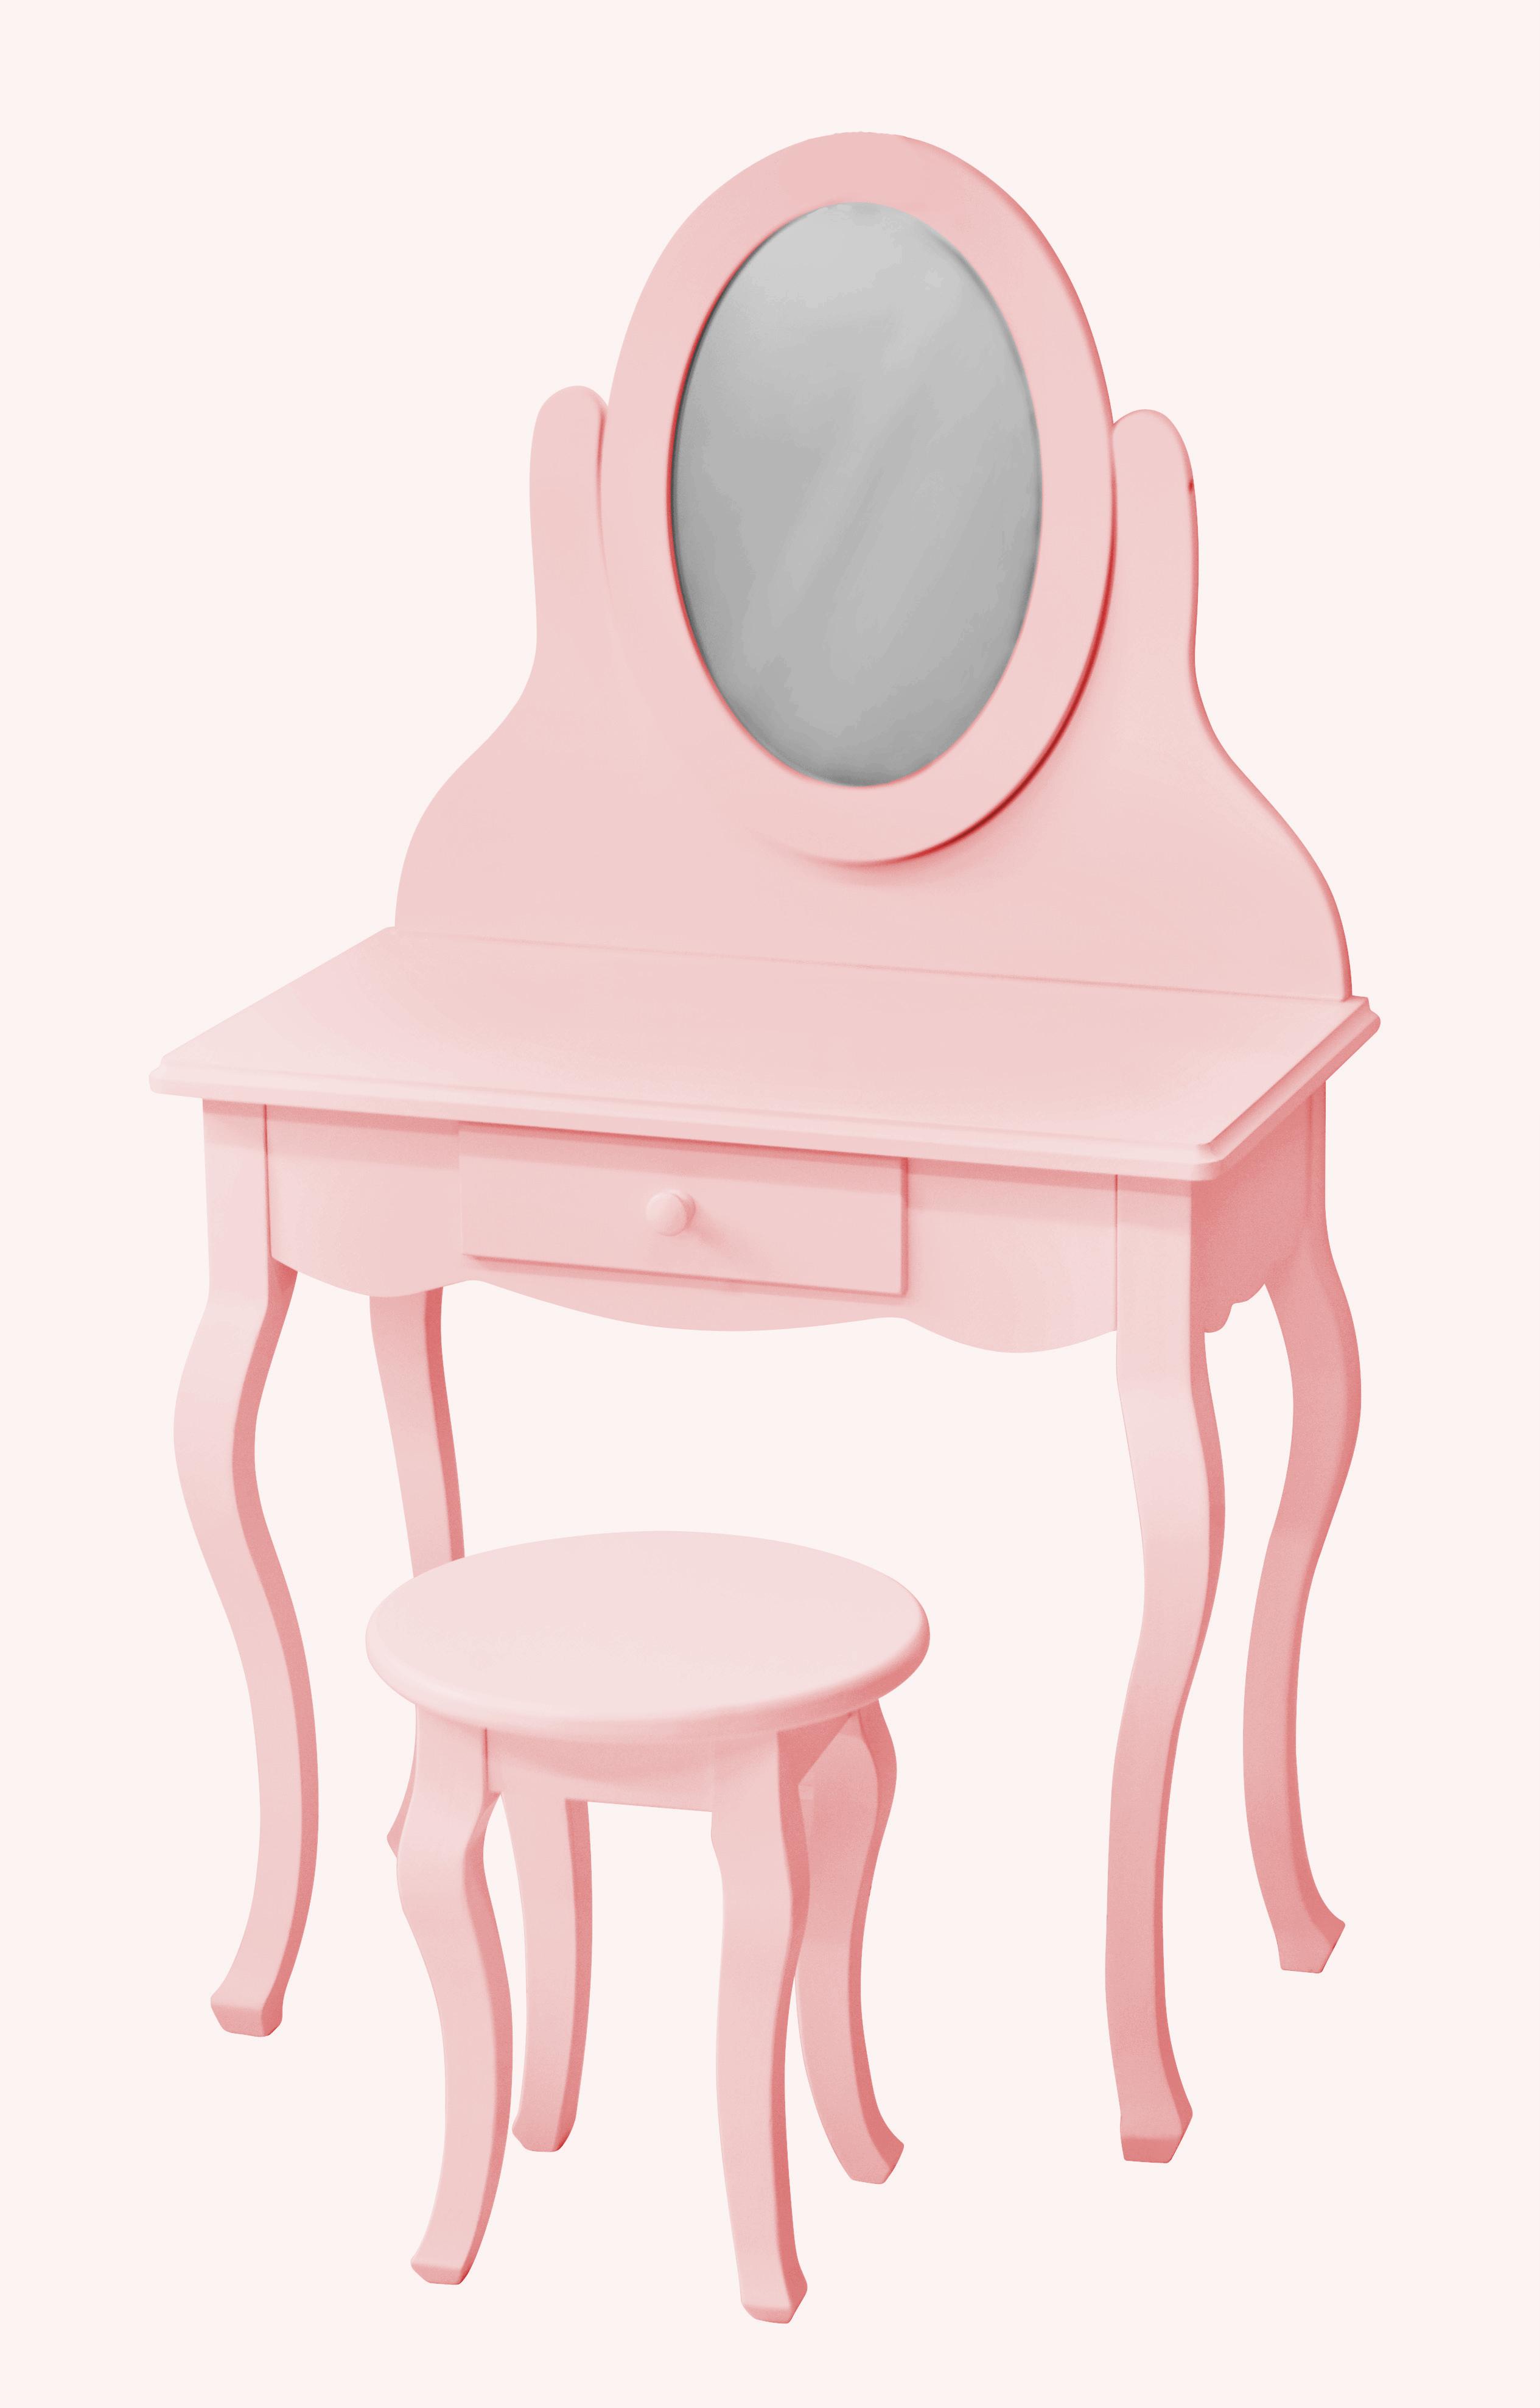 schminktisch rosa inkl hocker jetzt g nstig beim. Black Bedroom Furniture Sets. Home Design Ideas